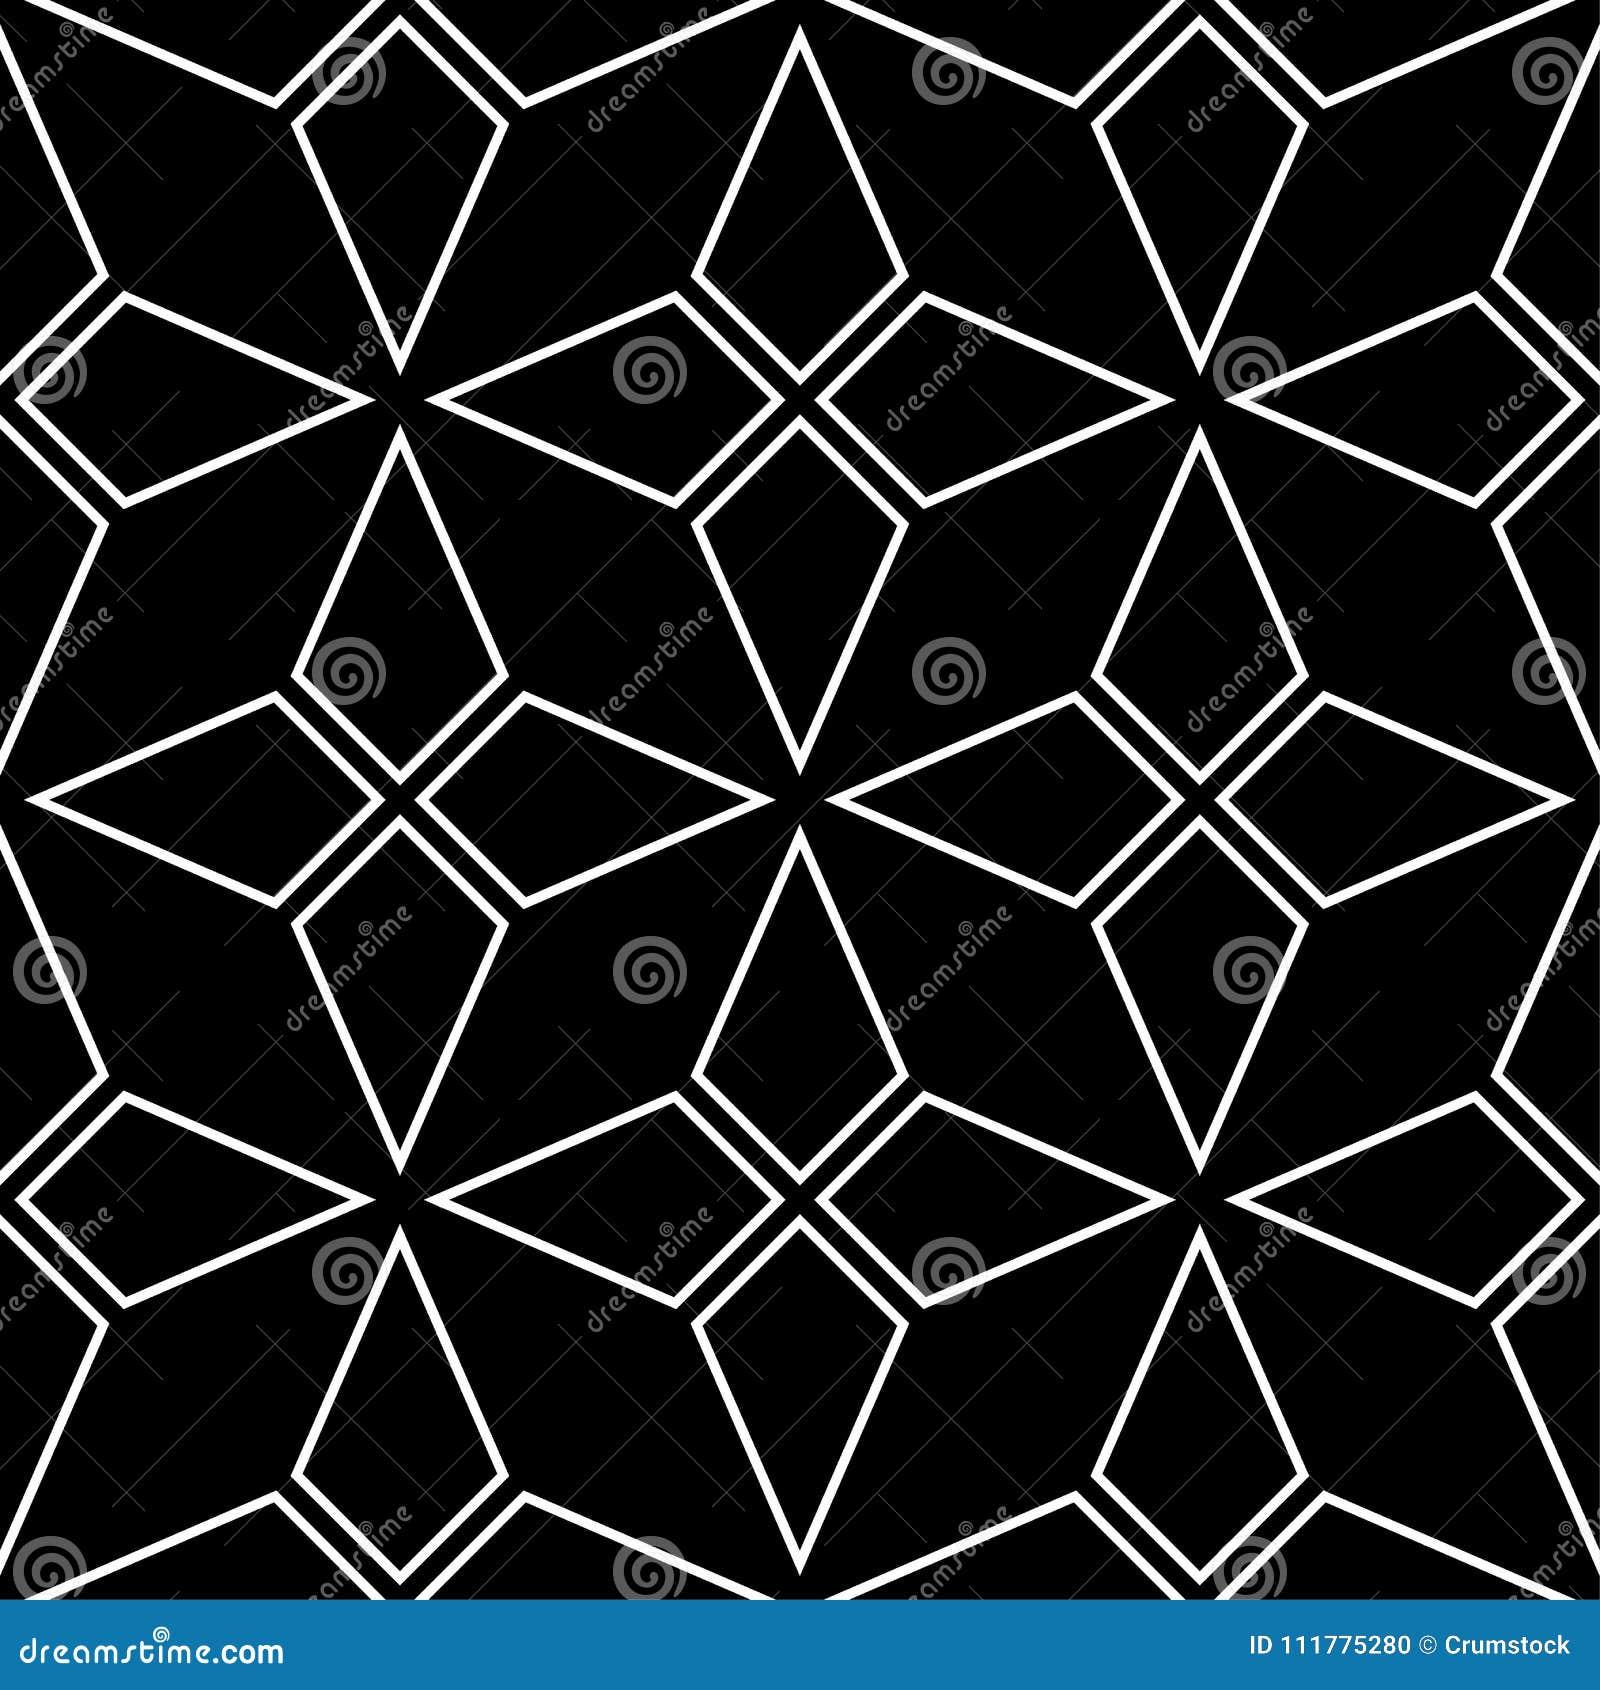 Geometric ornament. Black and white seamless pattern